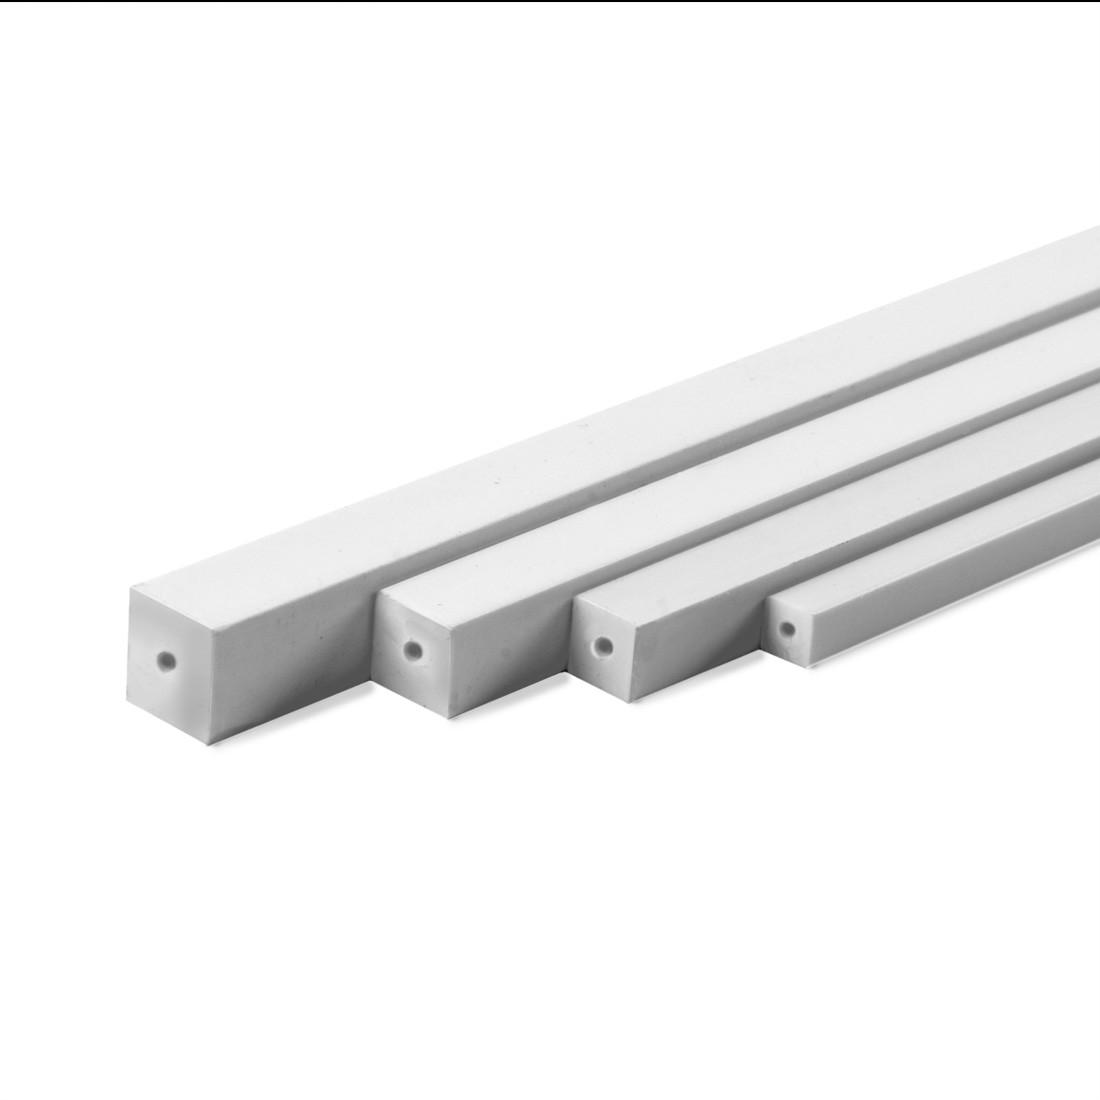 Profile ASA carré mm. 3x1000